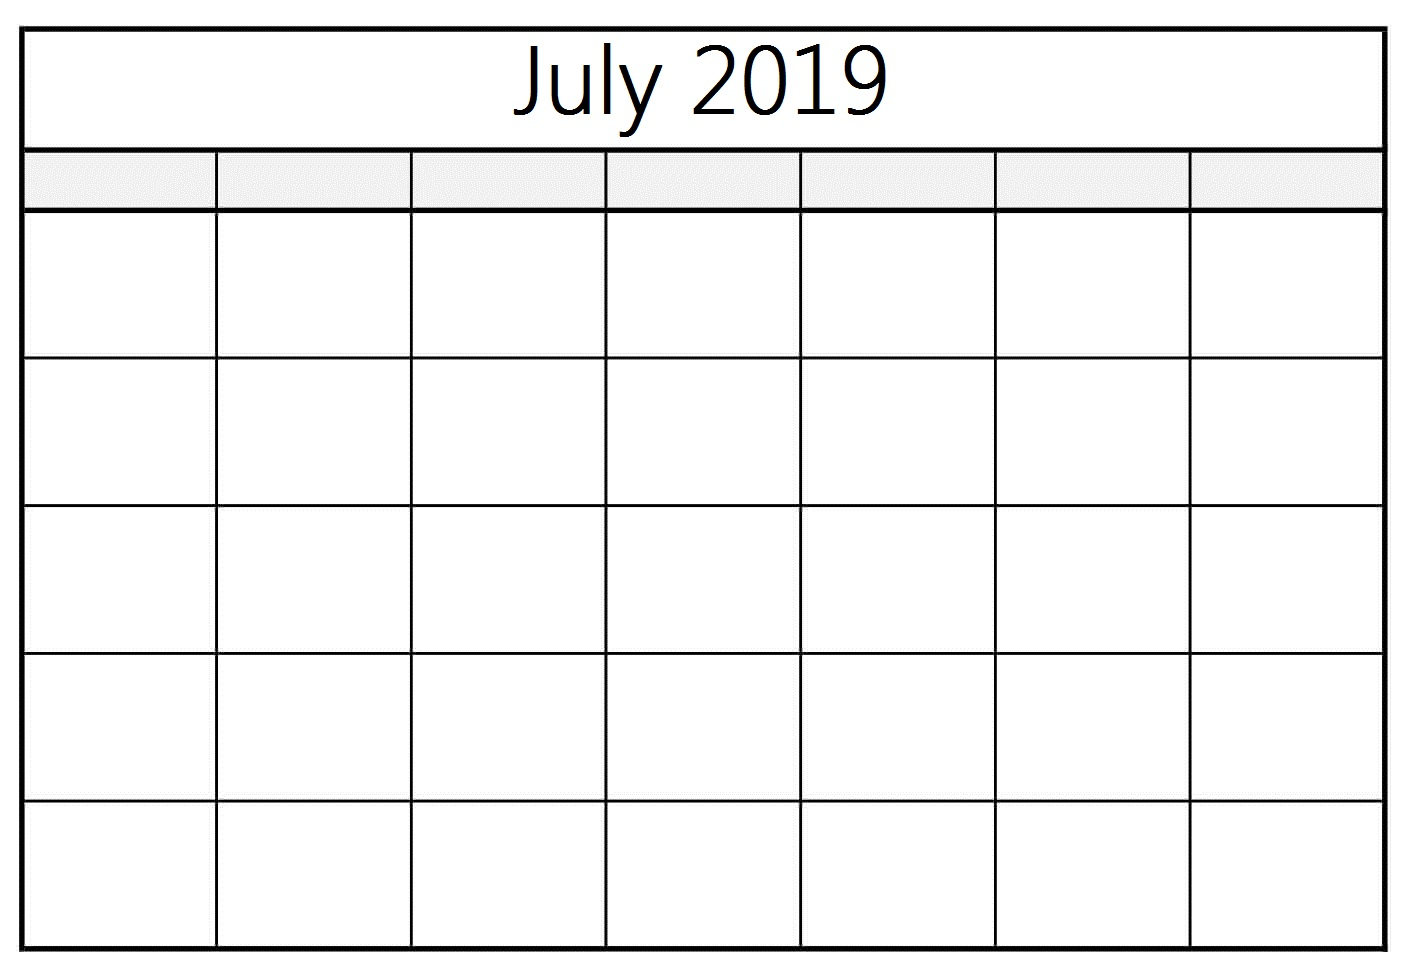 Blank Calendar July 2019 Template